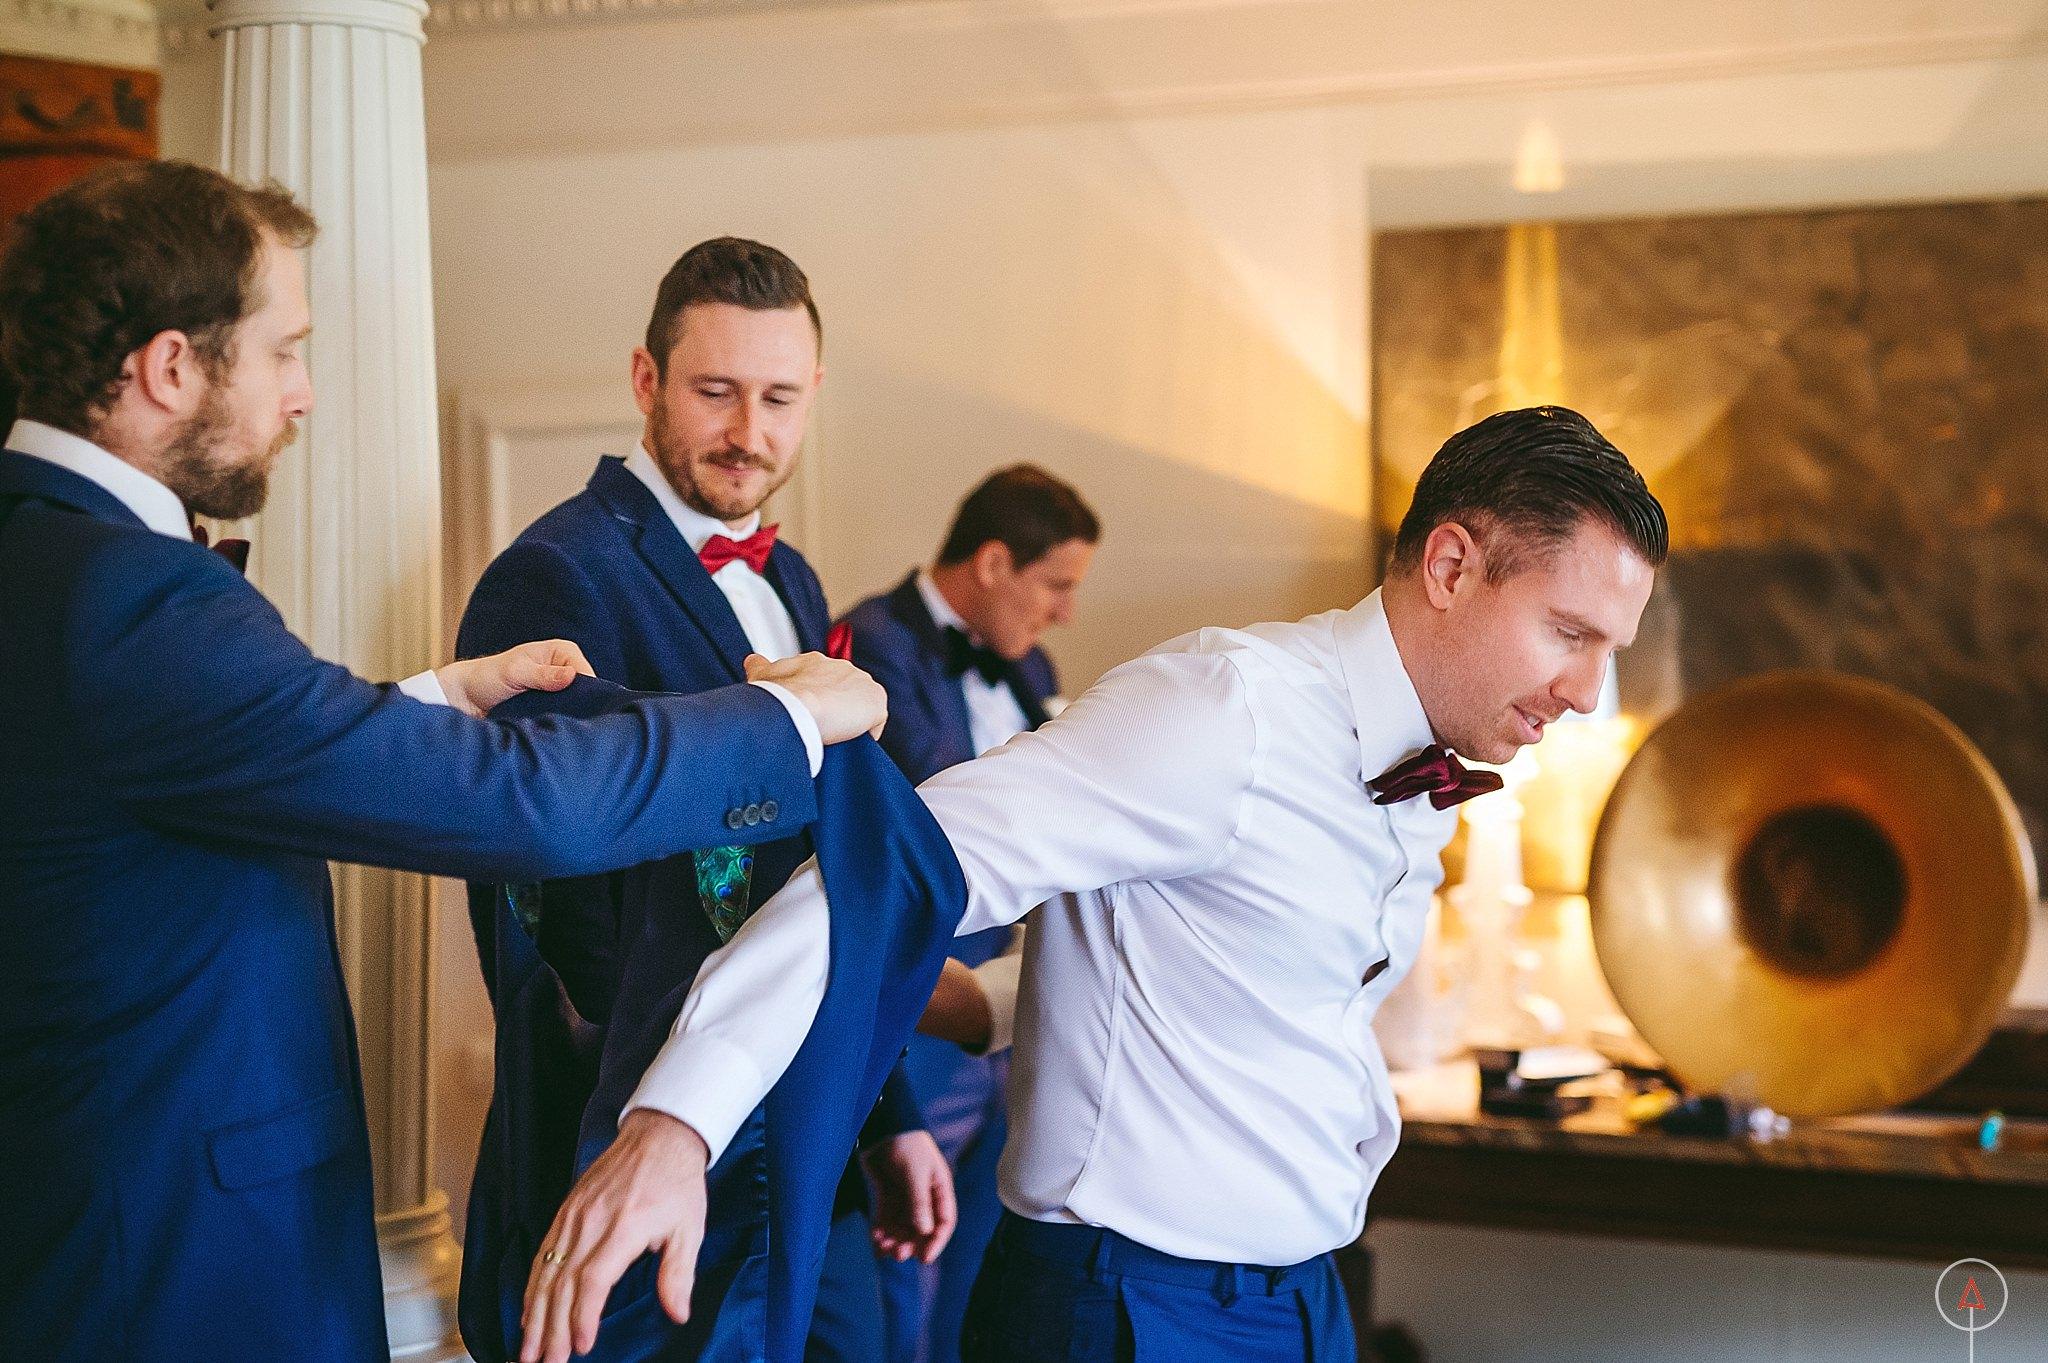 cardiff-wedding-photographer-aga-tomaszek_0225